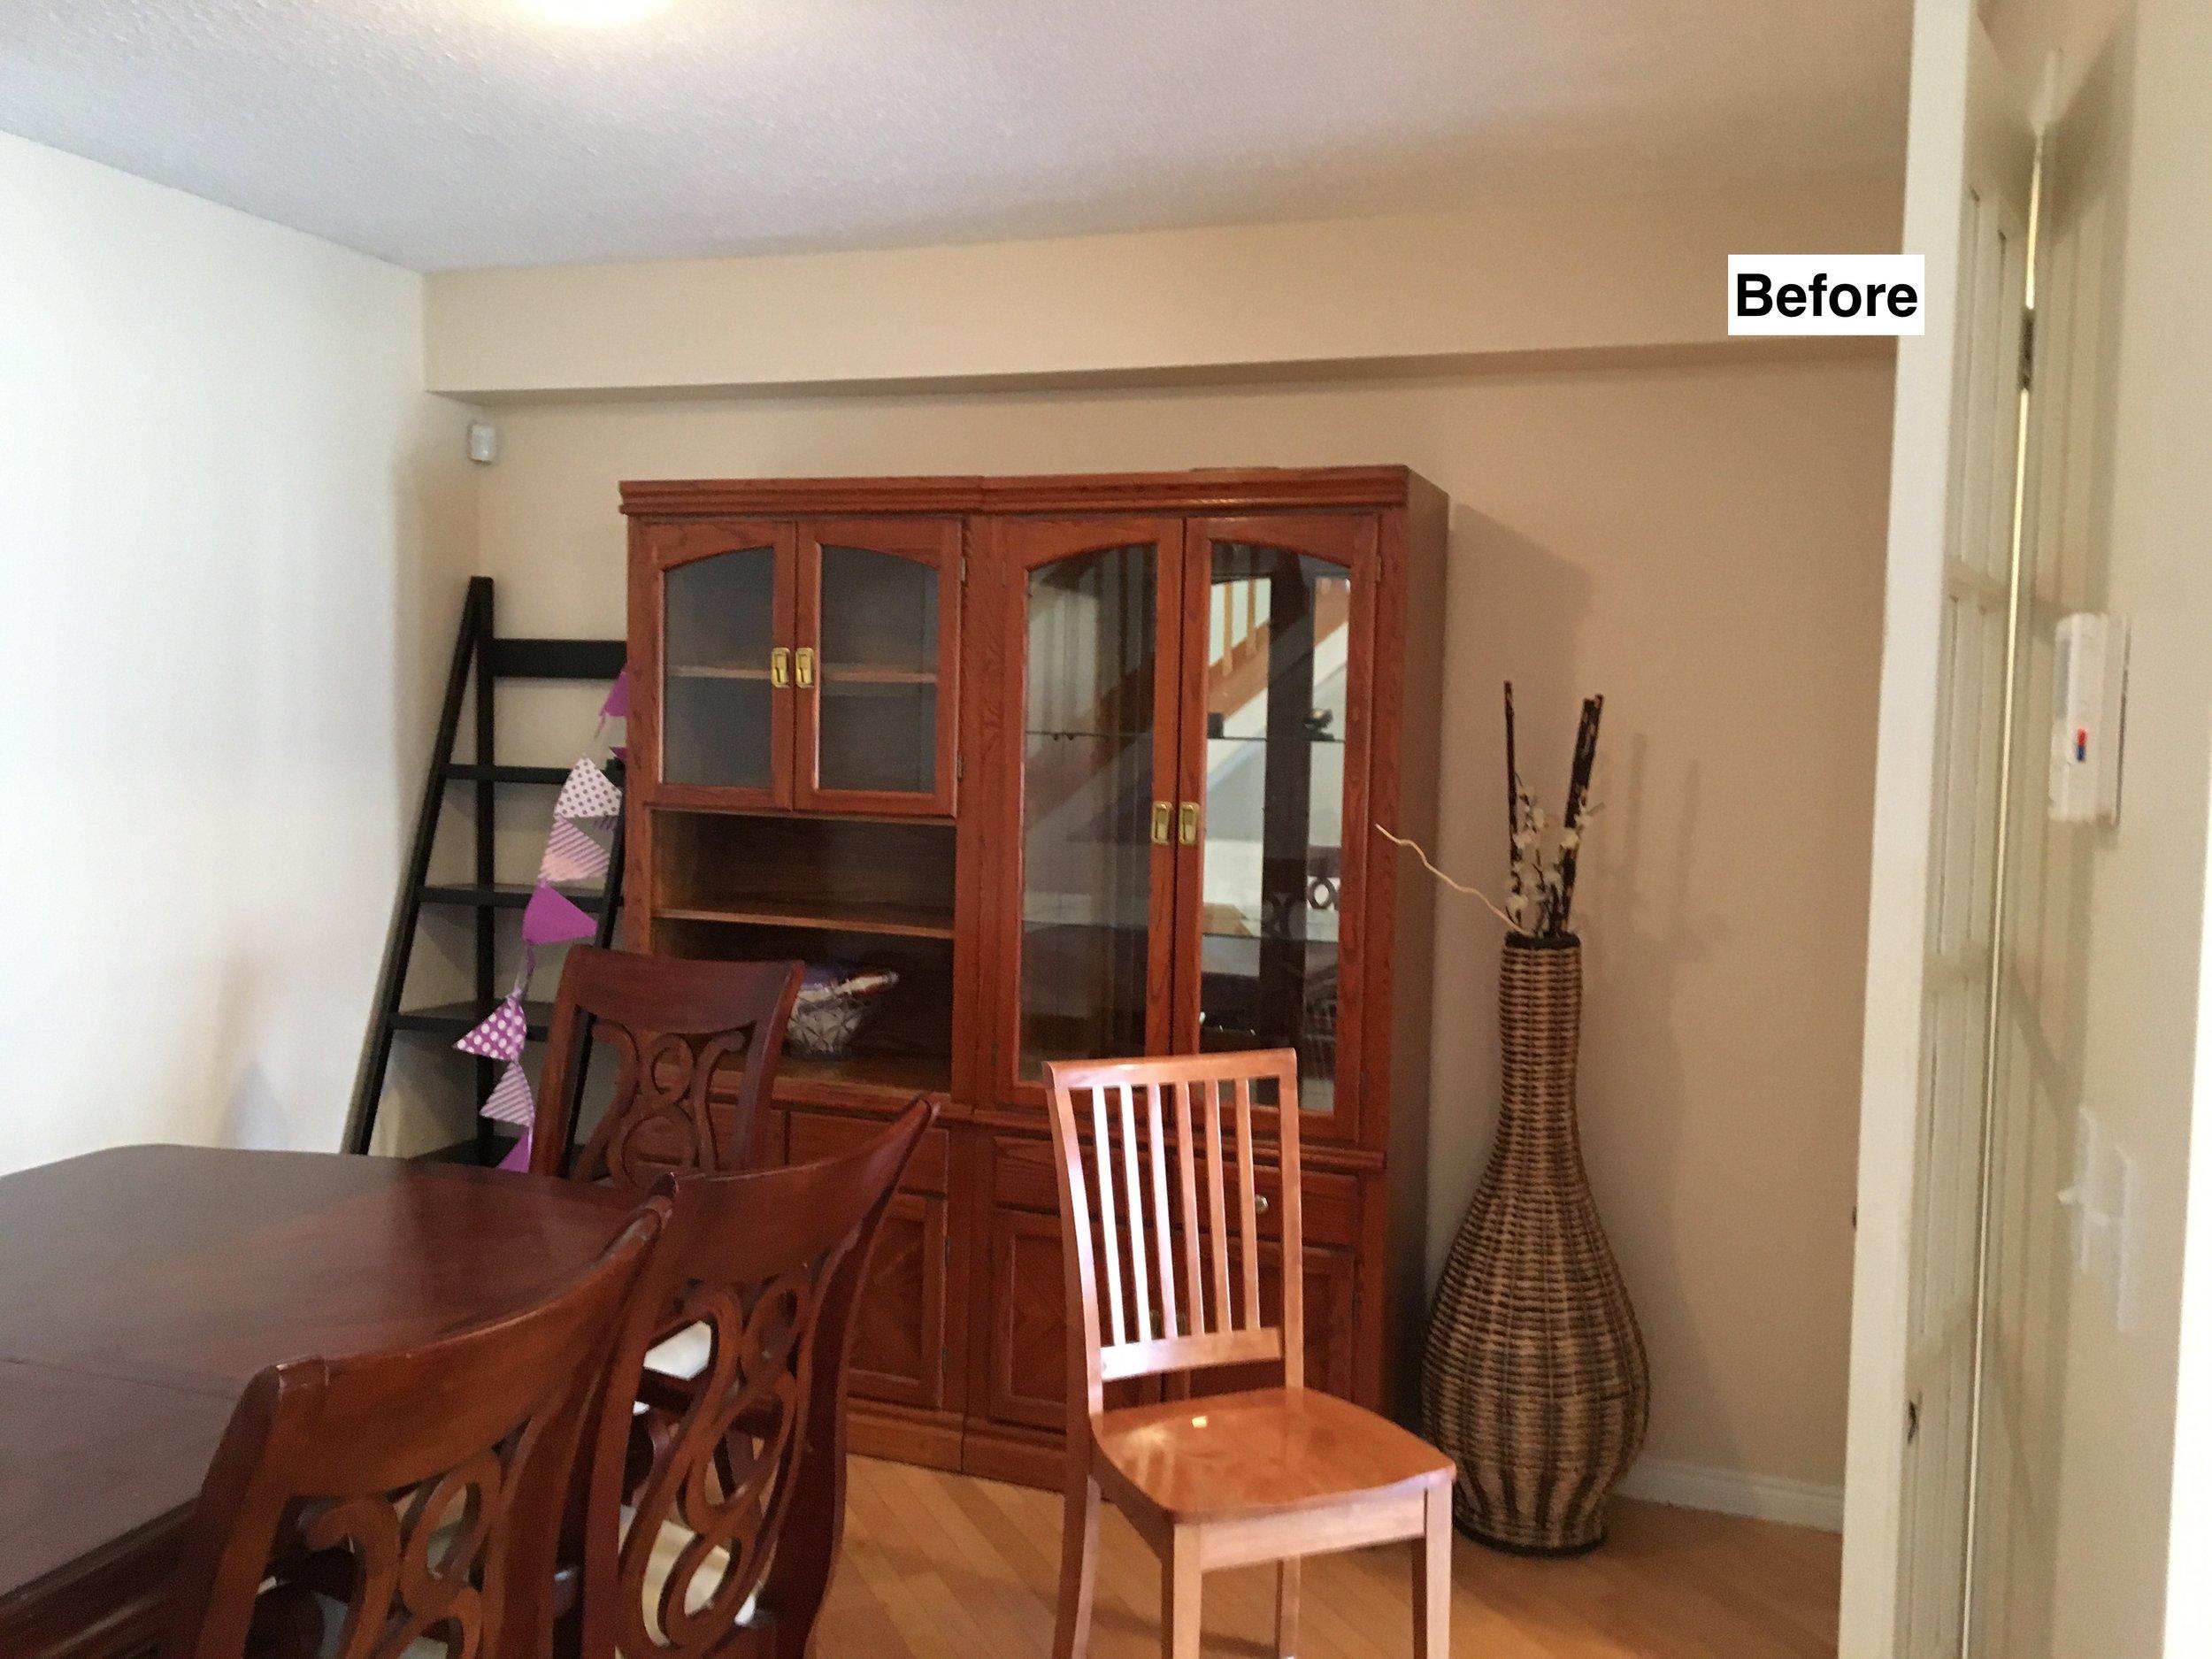 BJ Formal dining room - before.jpg